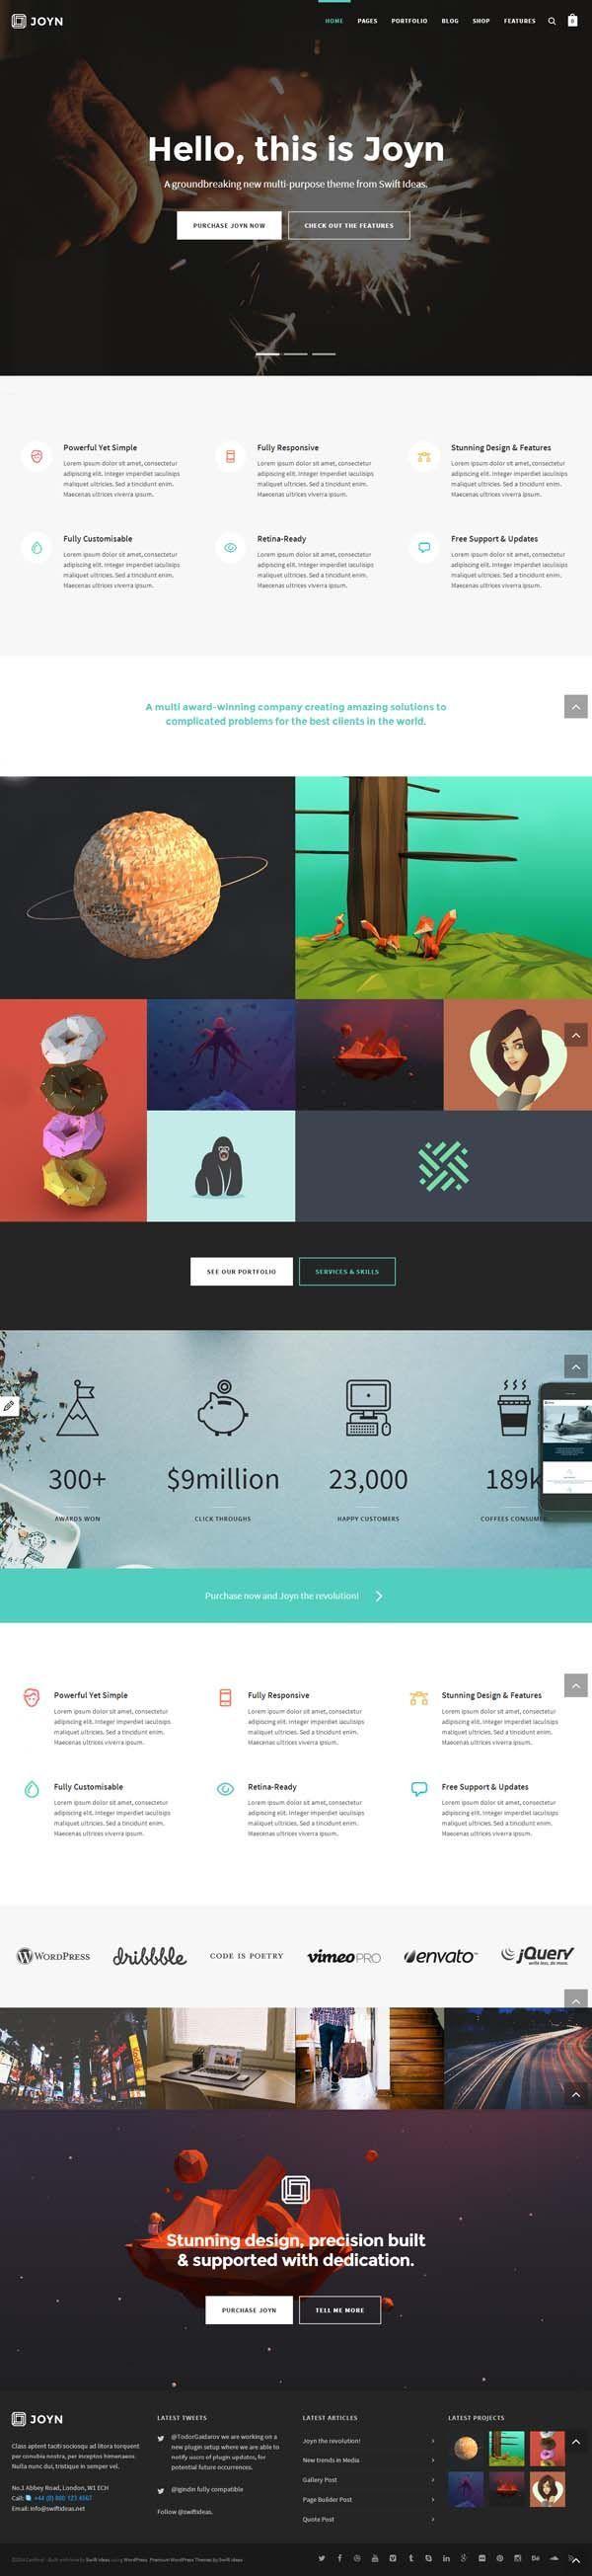 Joyn - Creative Multi-Purpose Theme by SwiftIdeas #wordpress #theme #website #webdesign #themeforest